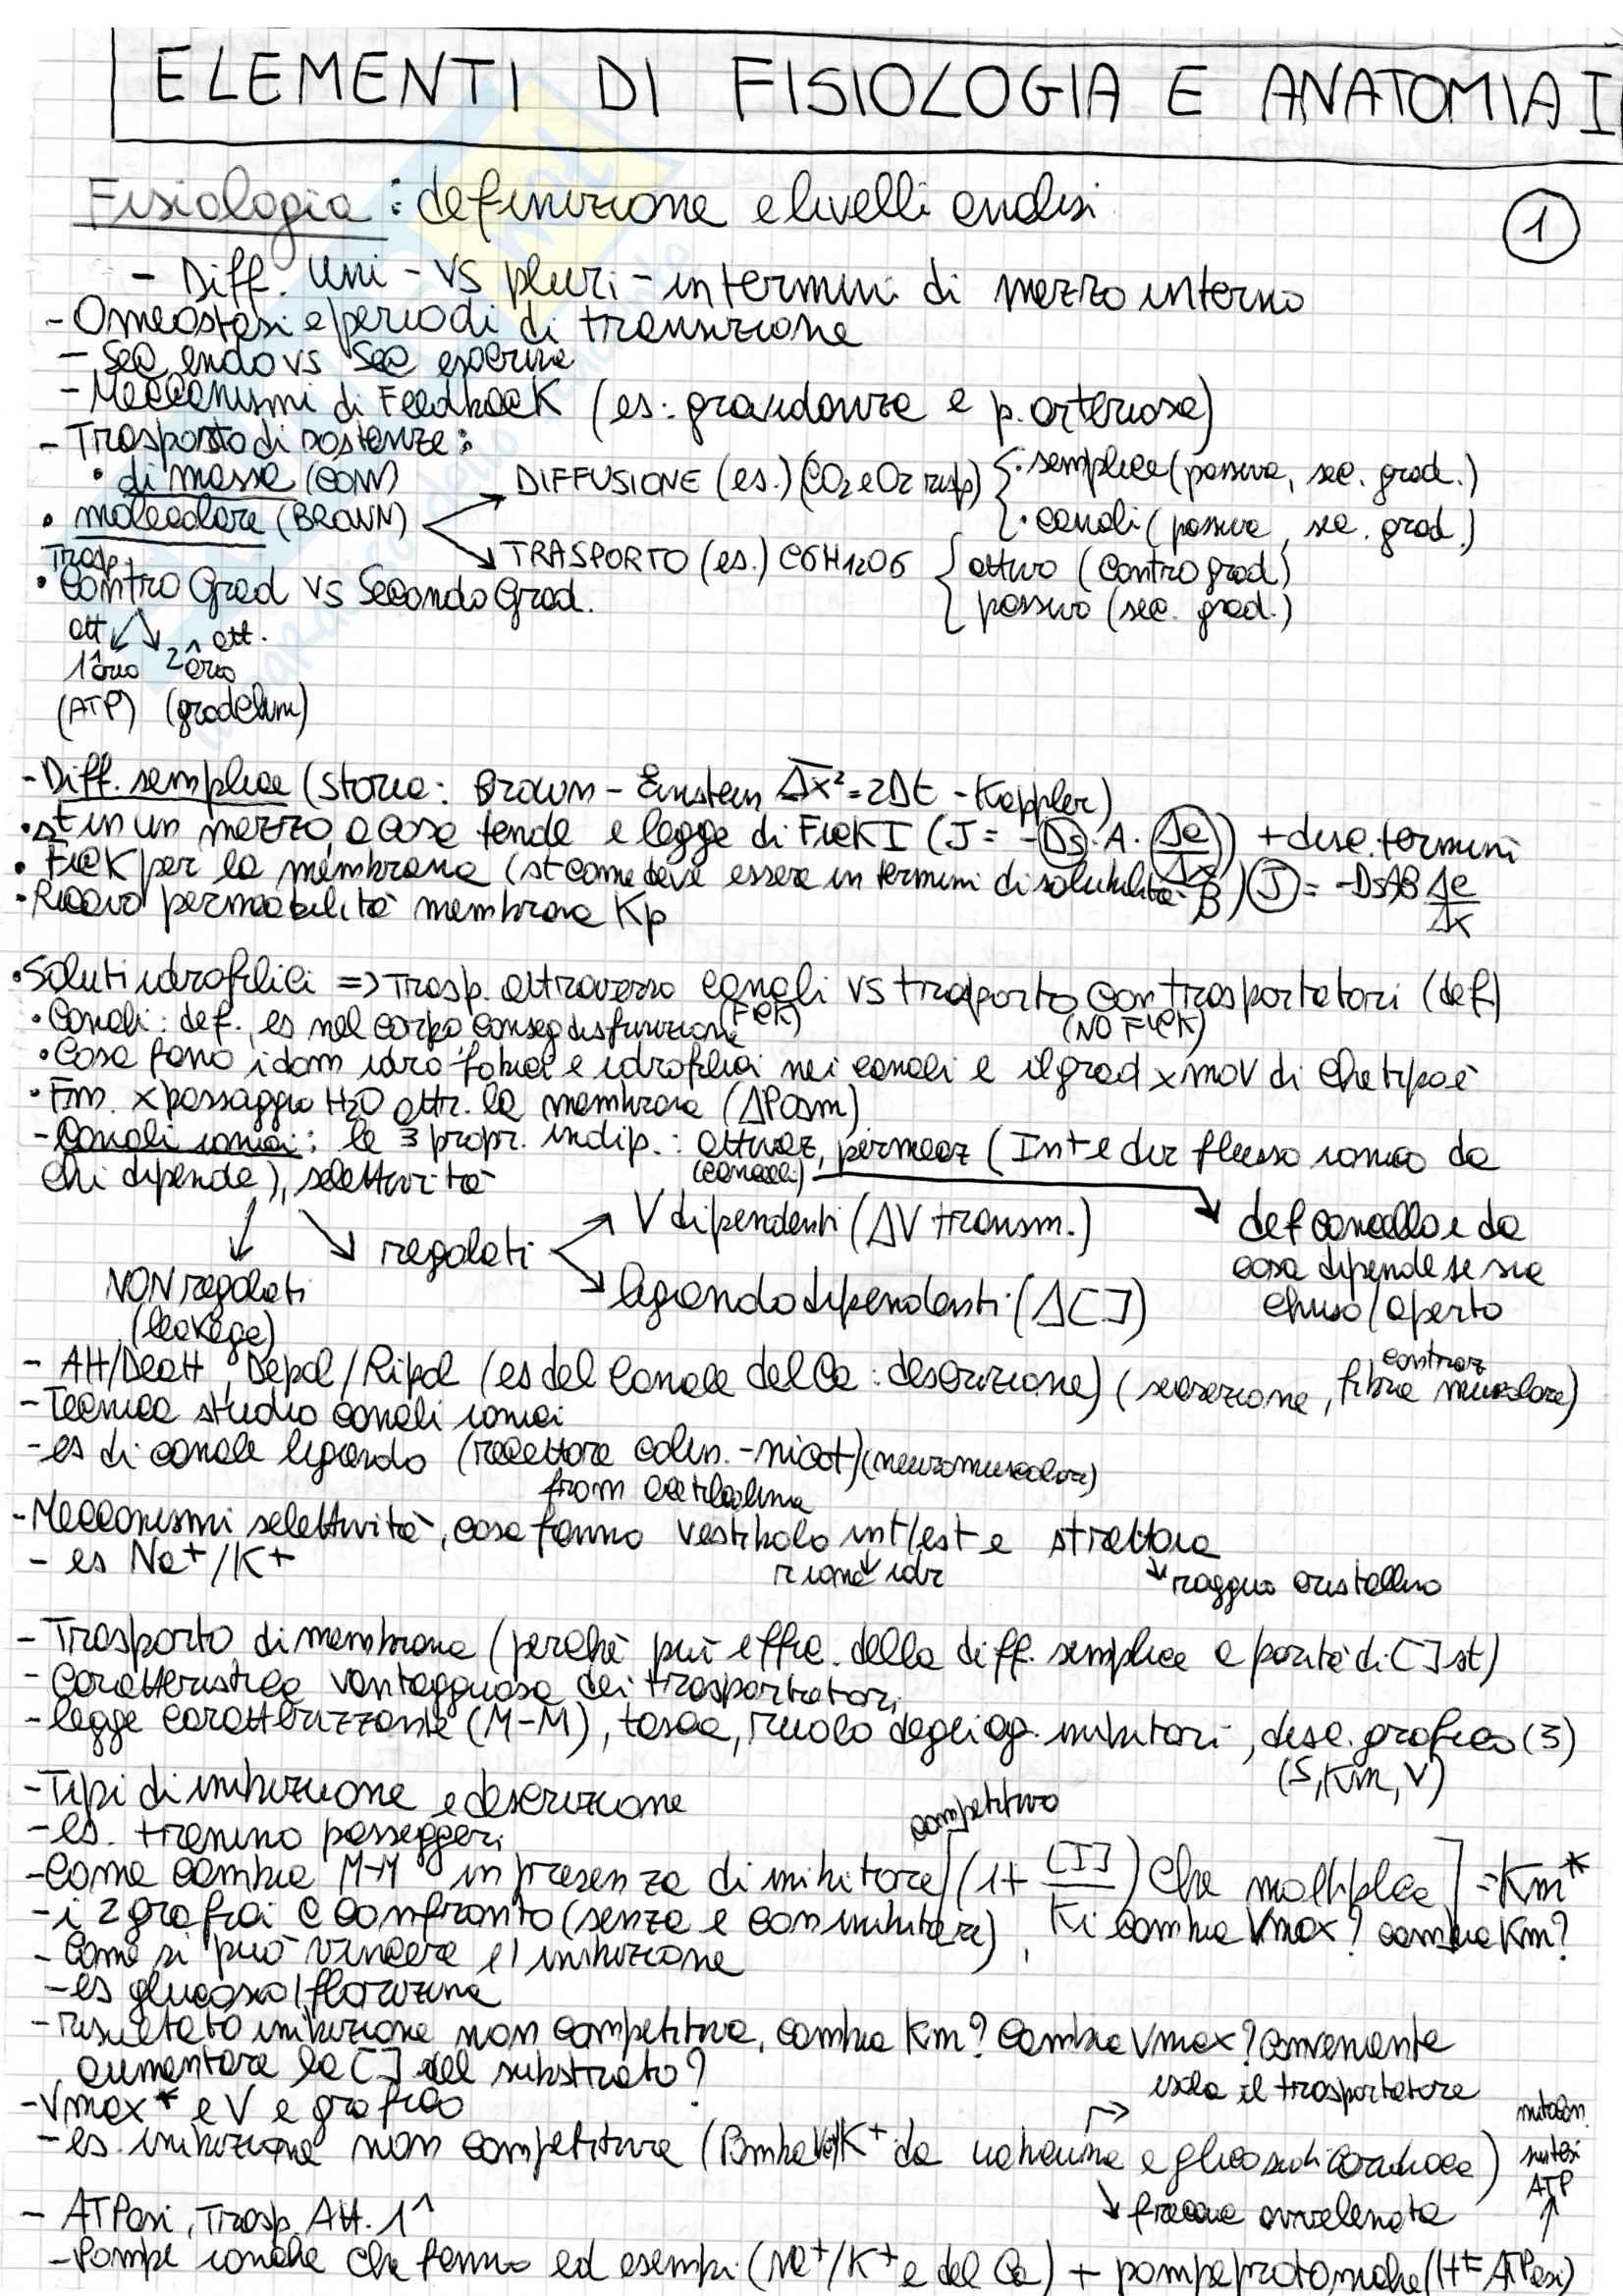 Anatomia, Biologia e Fisiologia I - Schemi Di Riepilogo